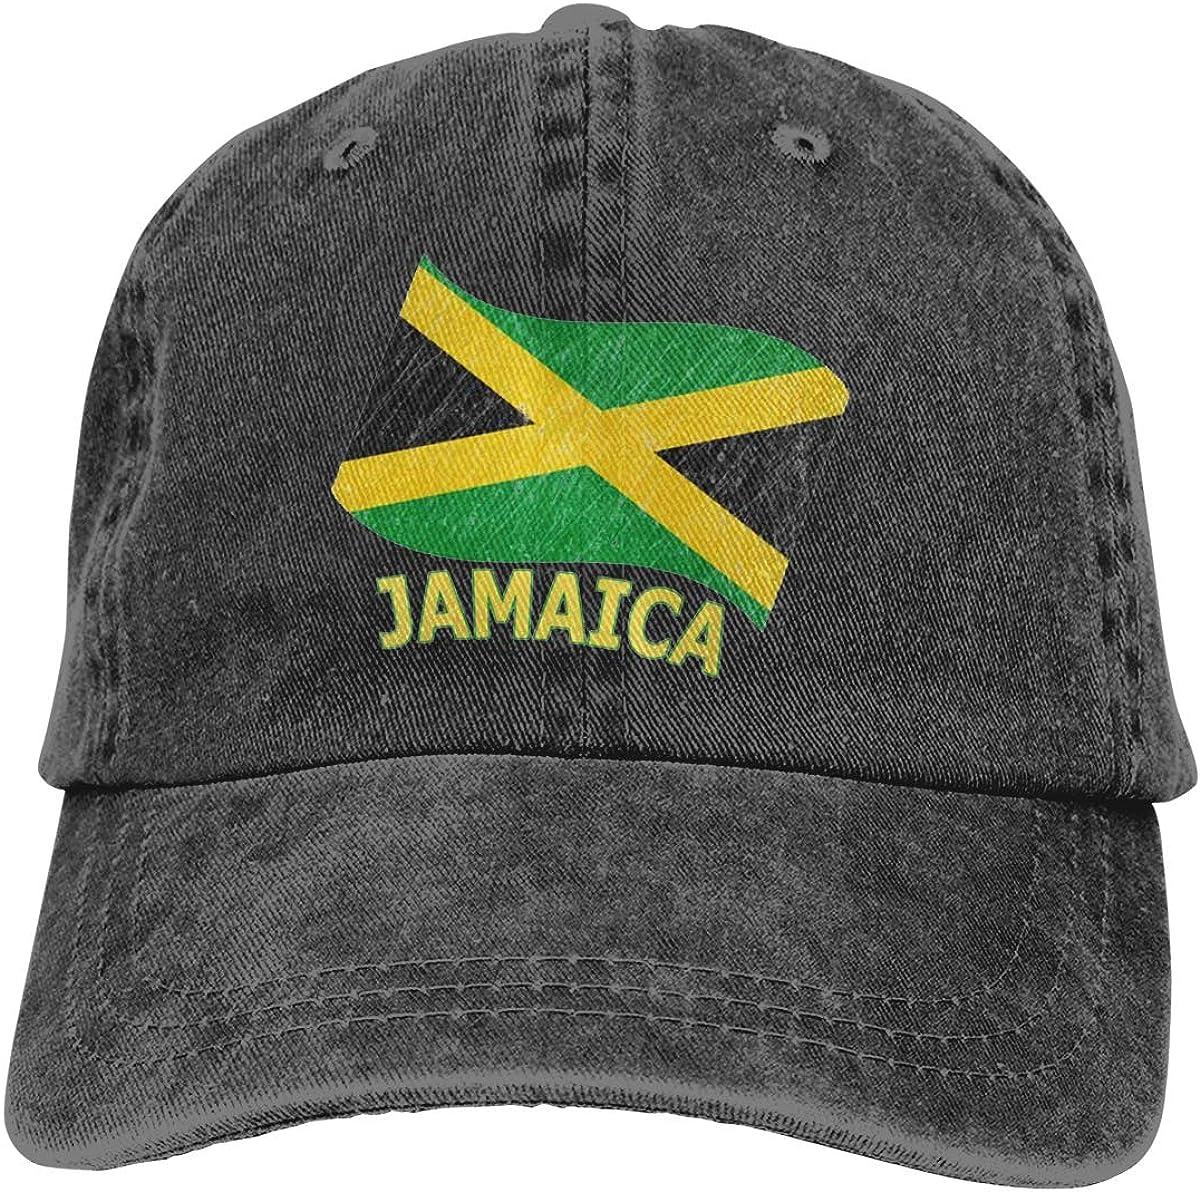 FEAIYEA Denim Cap Retro Wave Jamaican Flag Jamaican Pride Baseball Dad Cap Adjustable Classic Sports for Men Women Hat